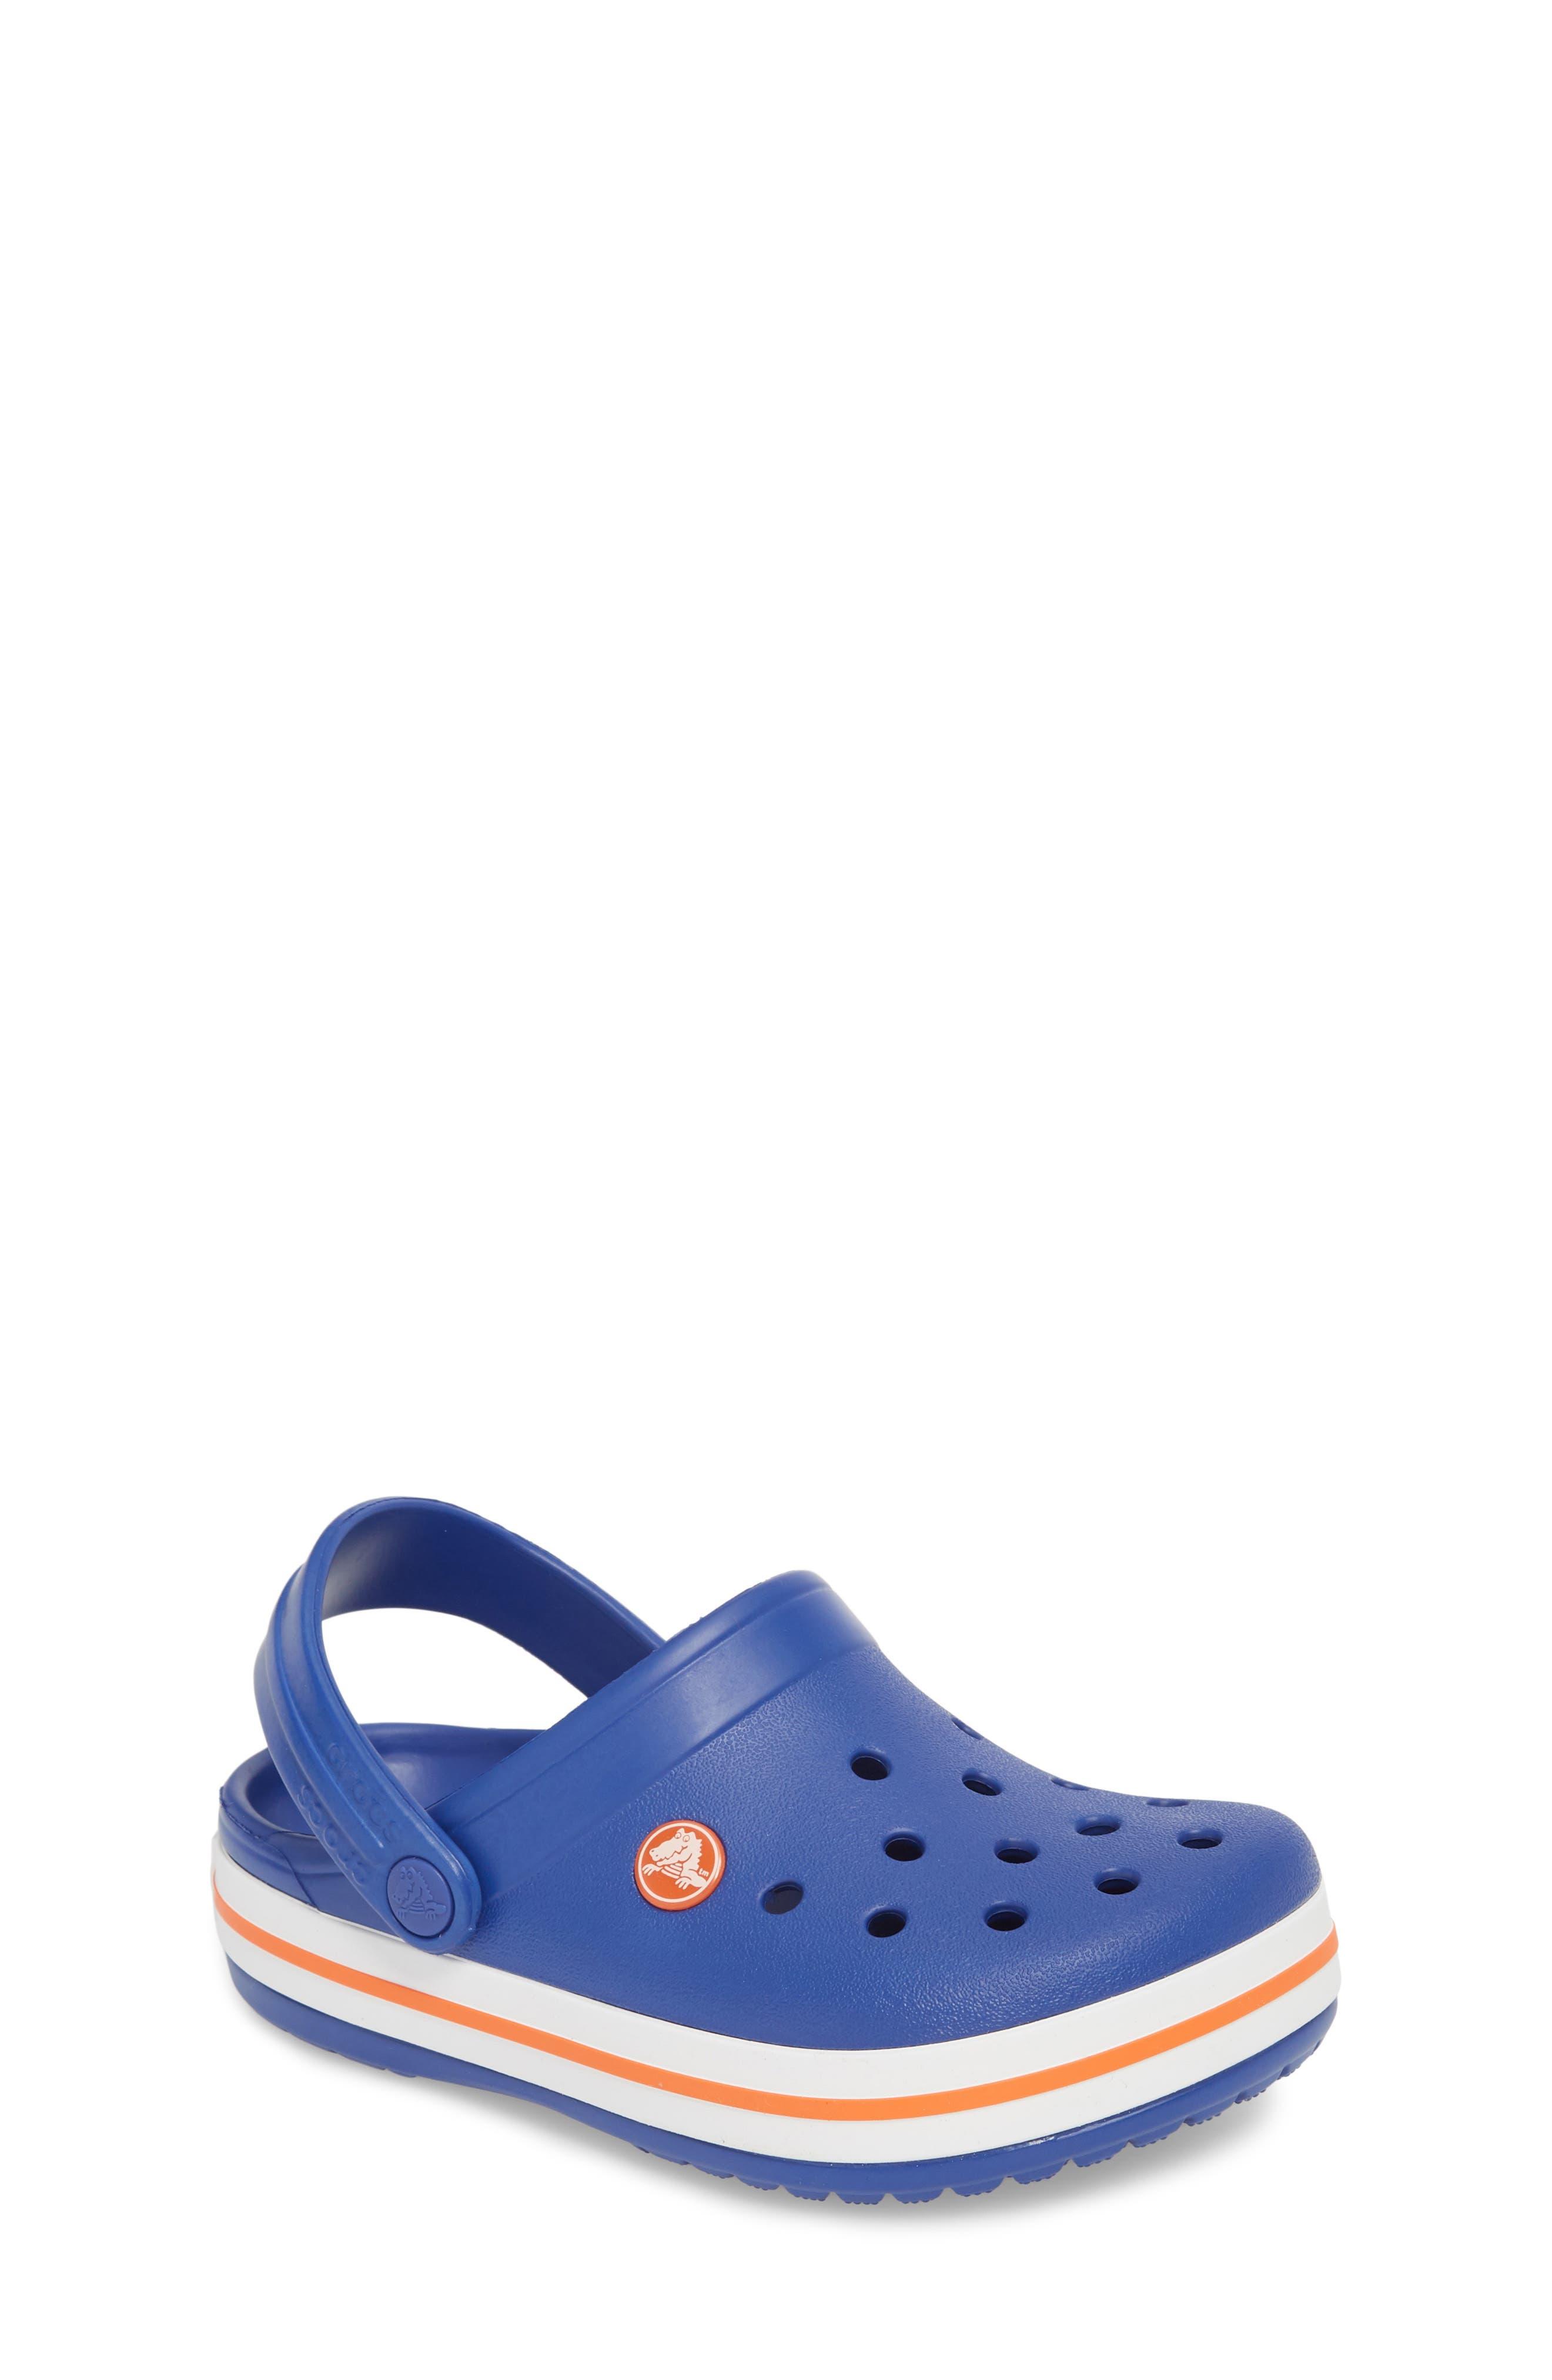 Image of Crocs Crocband Clog